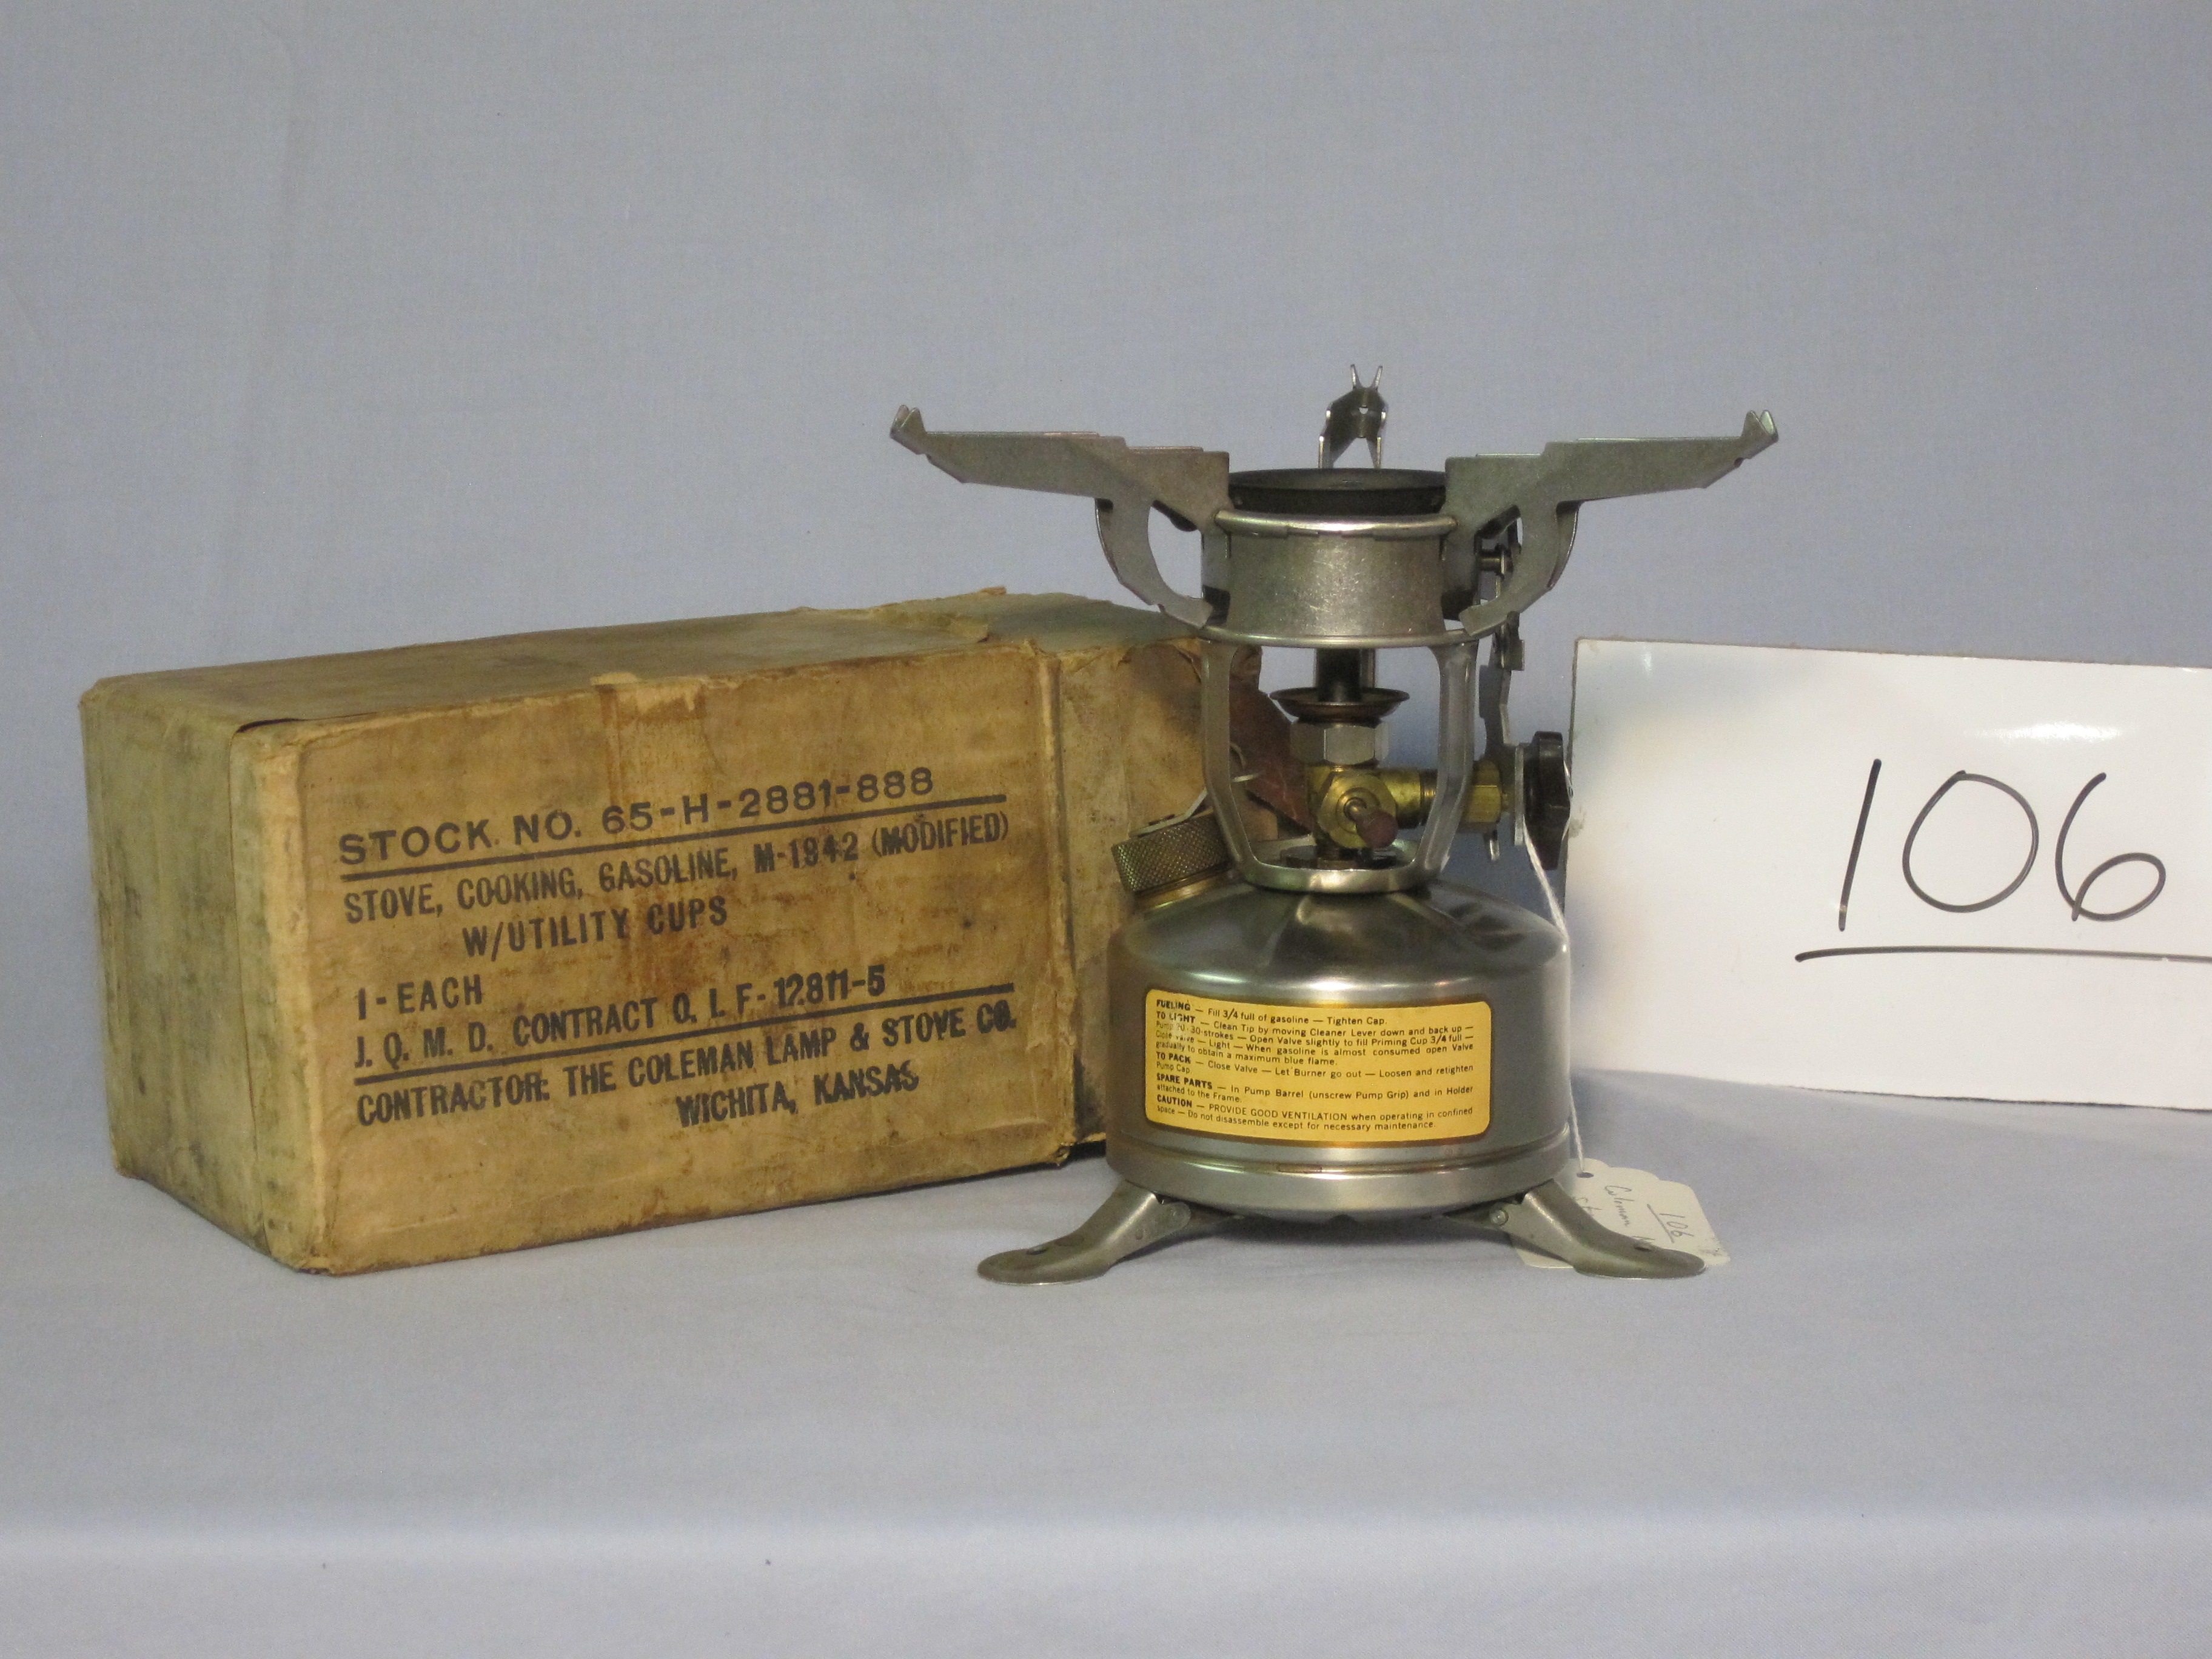 Coleman M-1942